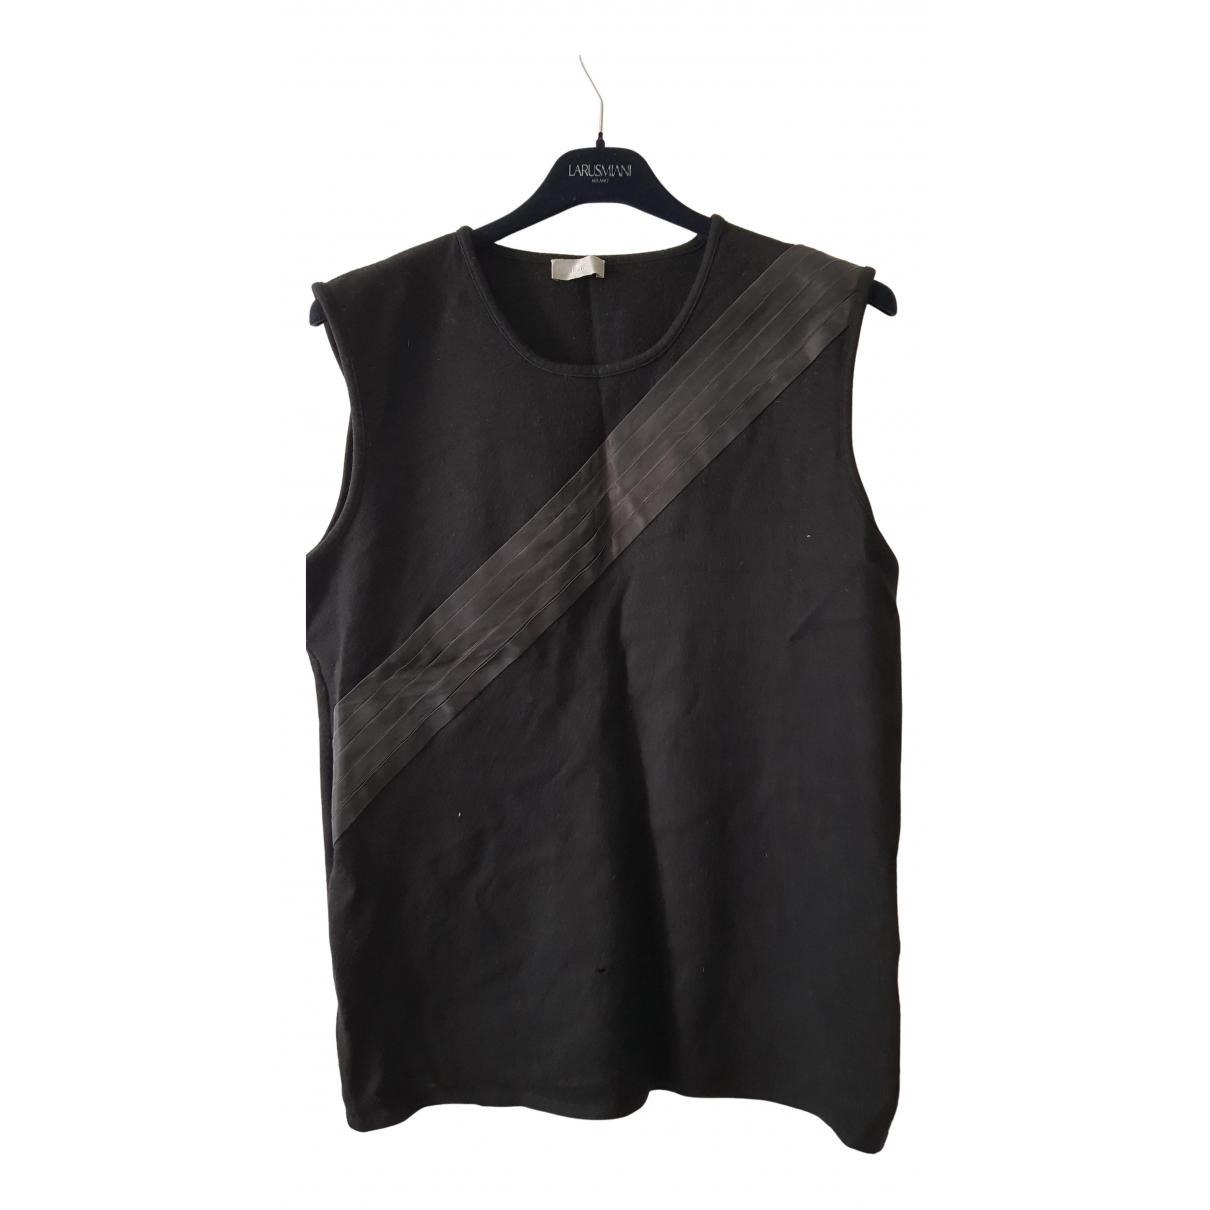 Camiseta de Lino Dior Homme